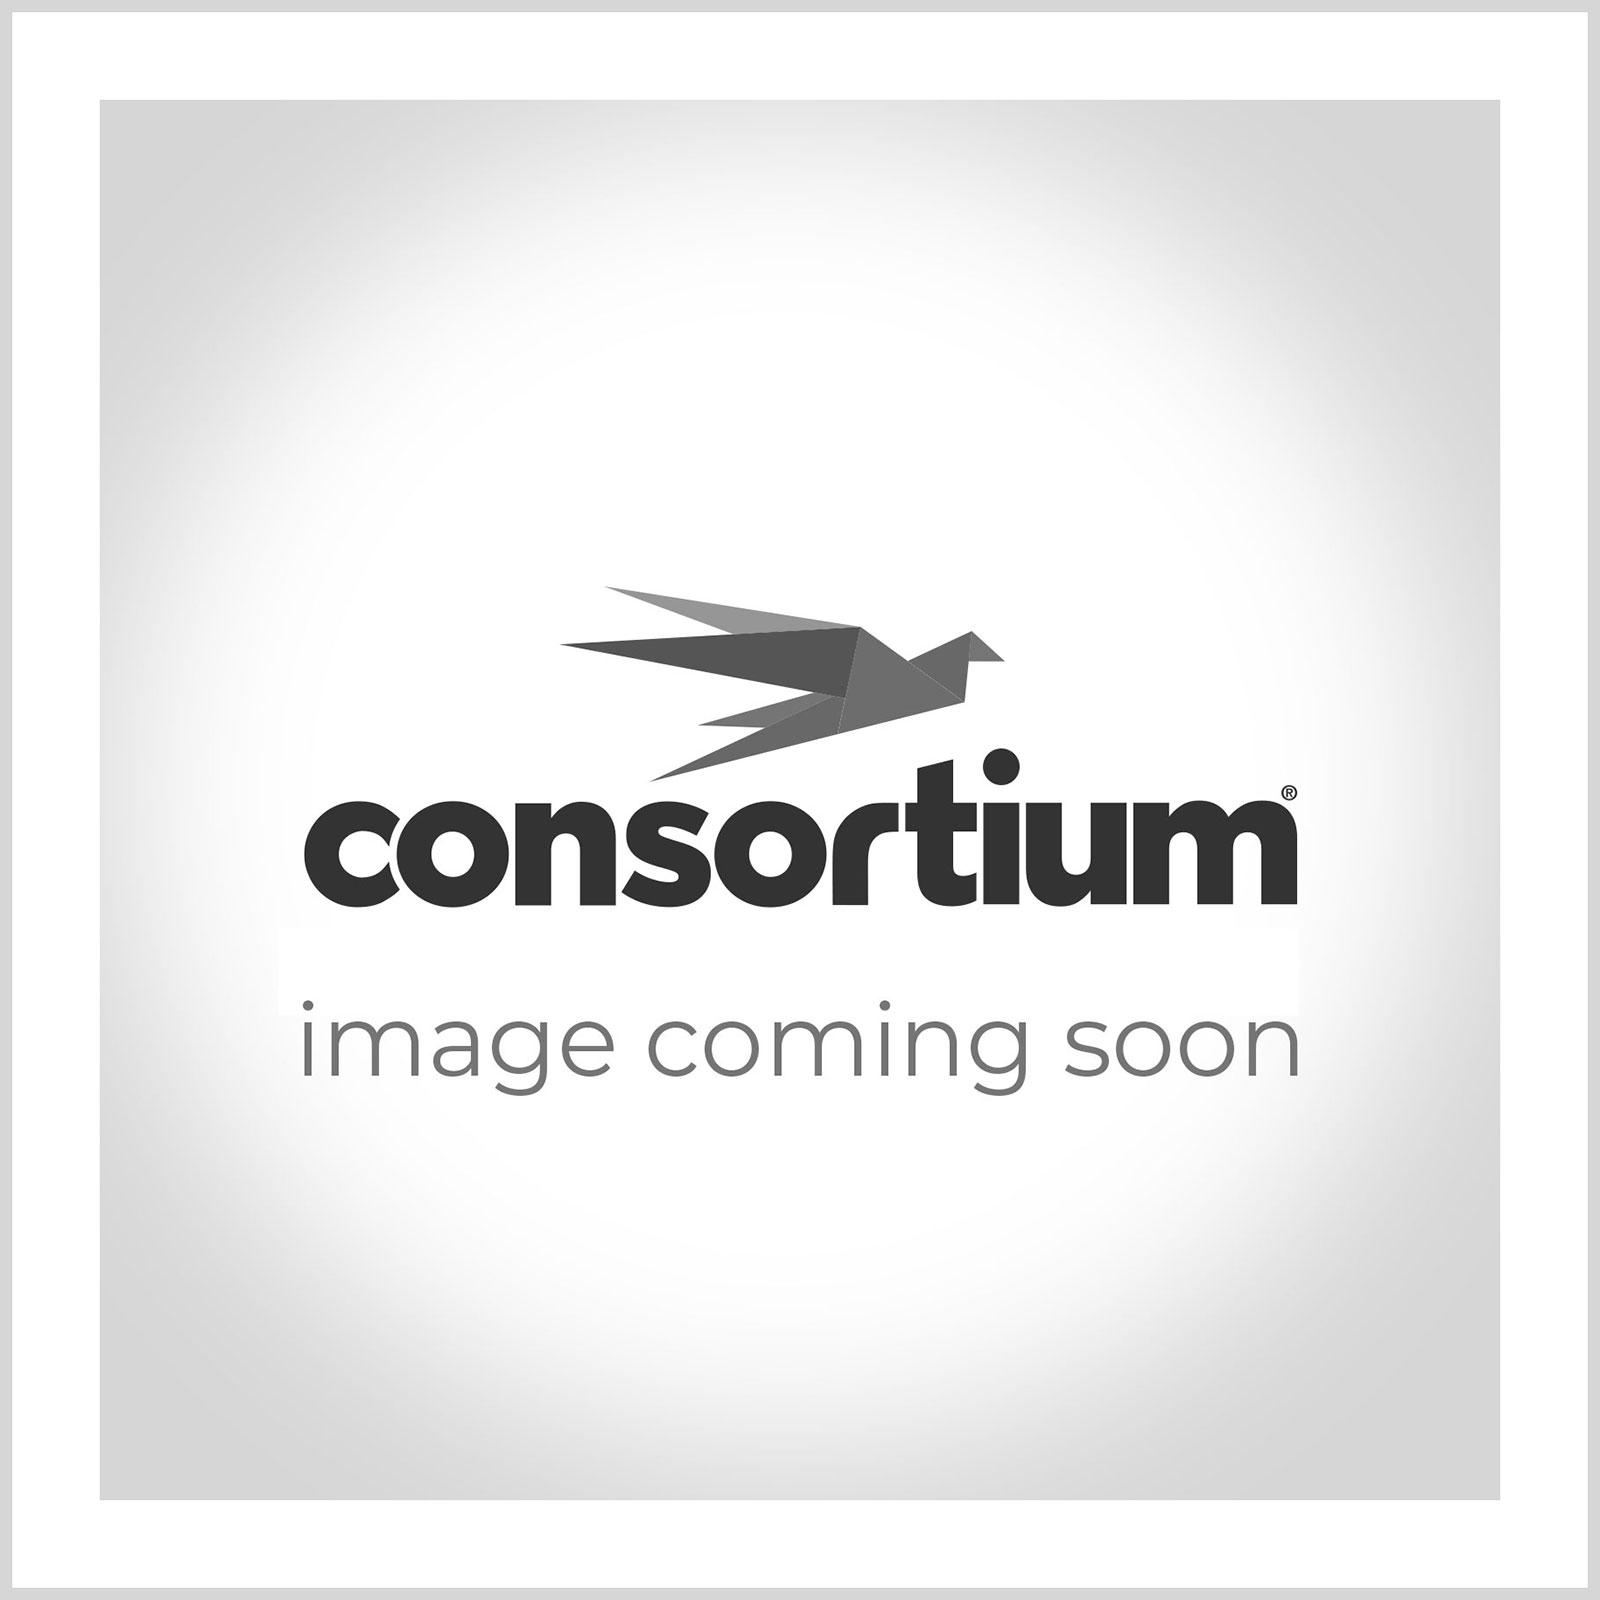 The Consortium Archive Storage Box